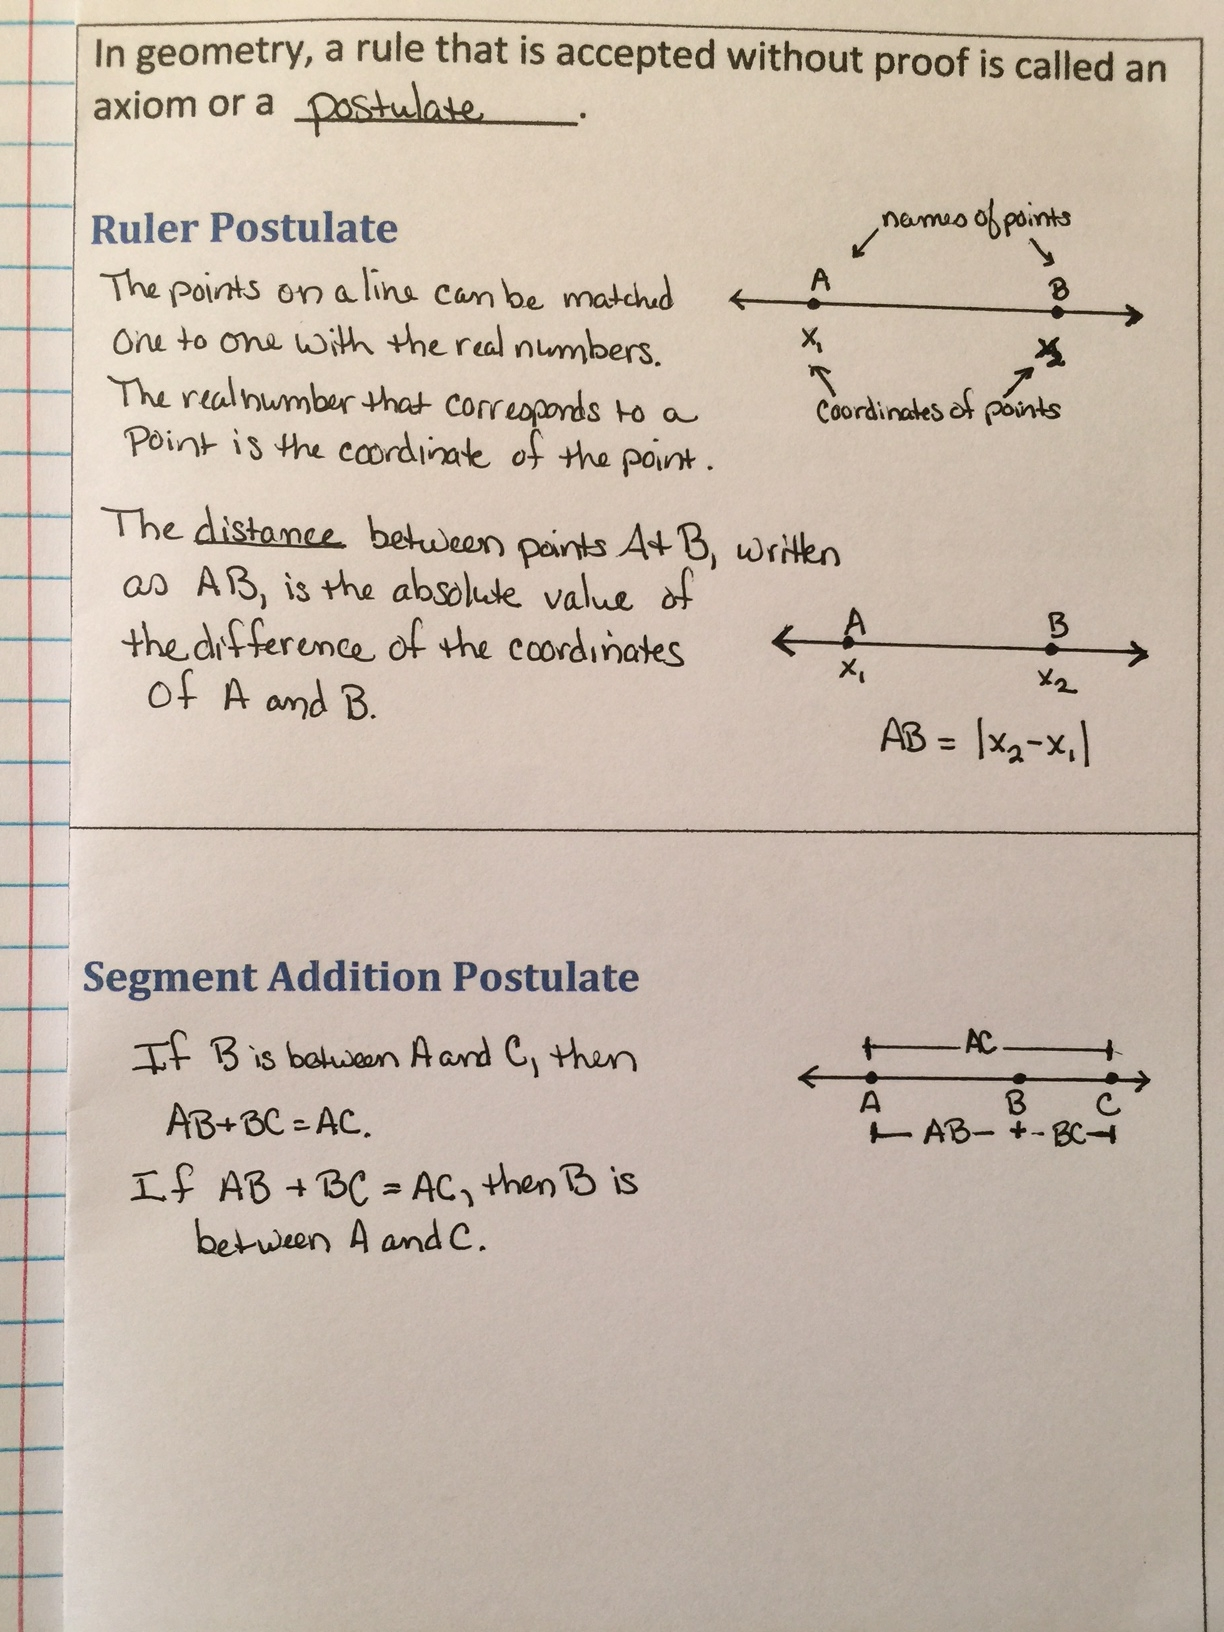 Ruler And Segment Addition Postulates